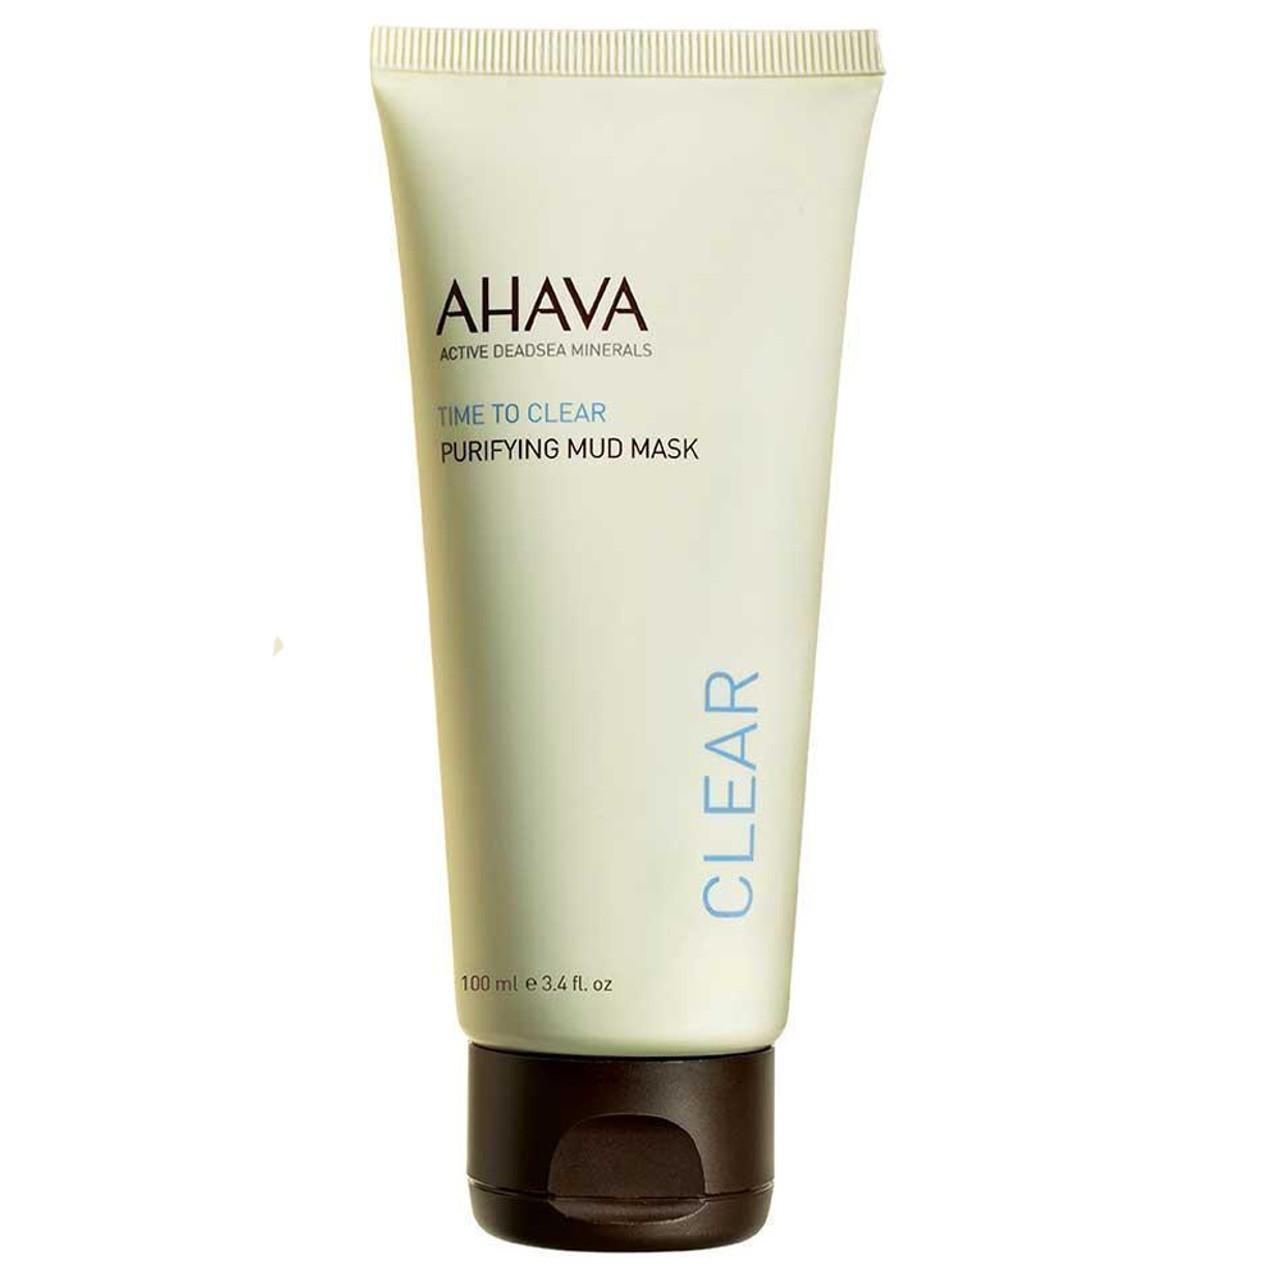 AHAVA Purifying Mud Mask BeautifiedYou.com